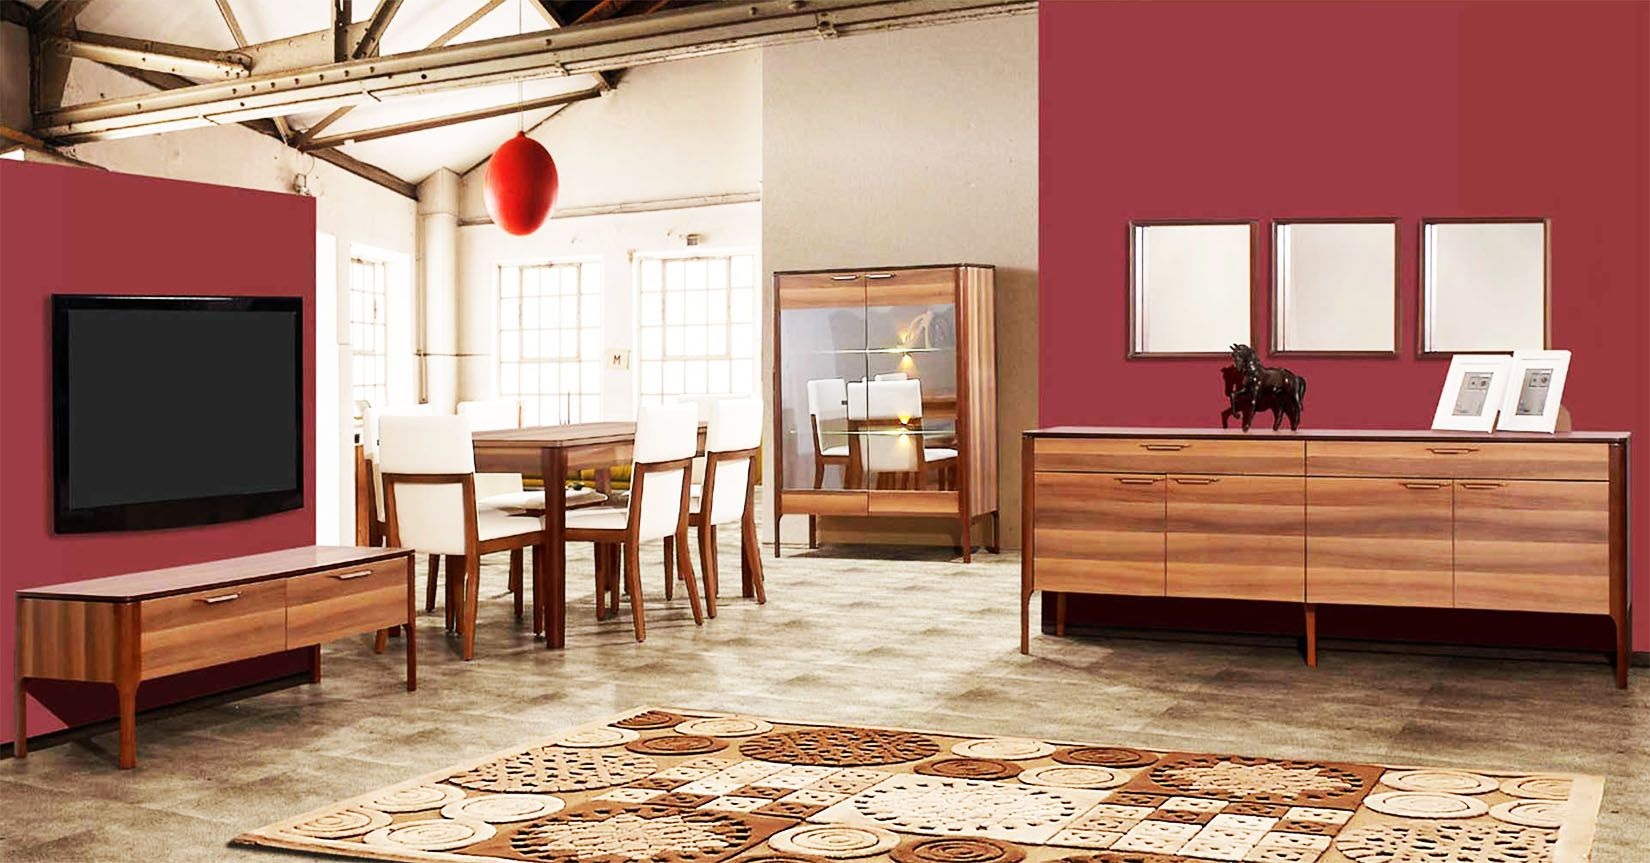 Cozy Home Interior Design Ideas in 2018